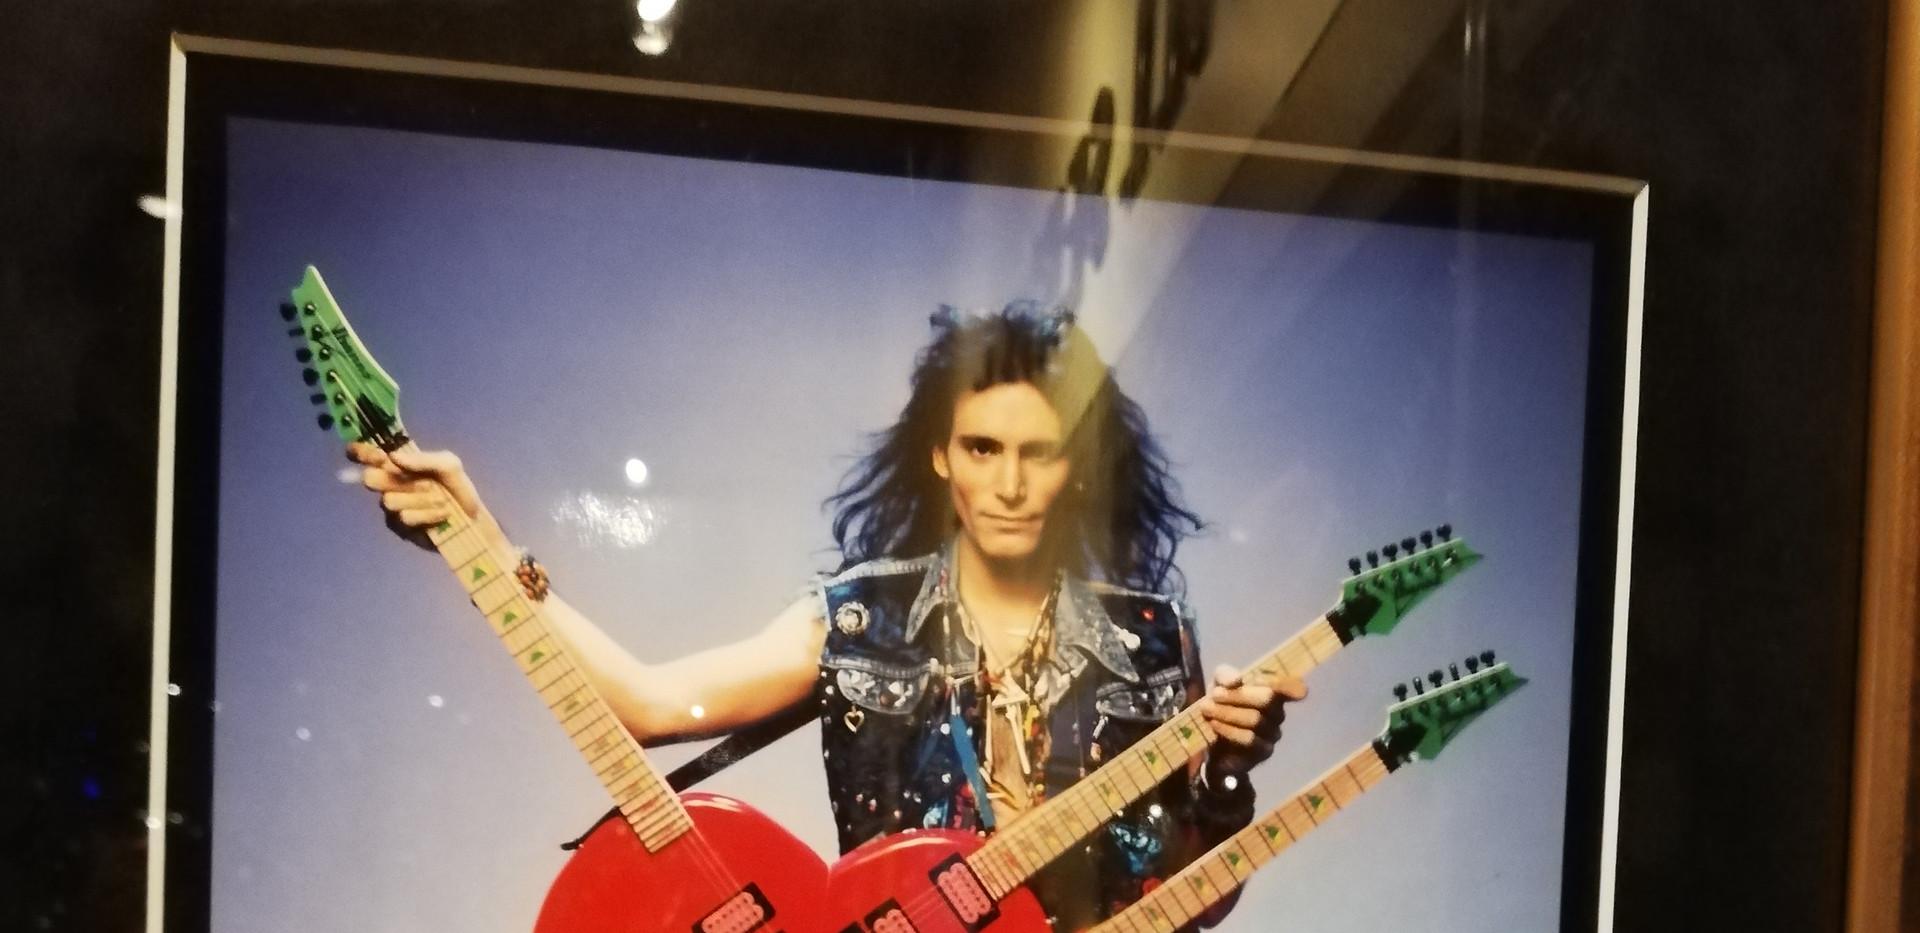 Hard_rock_café.jpg